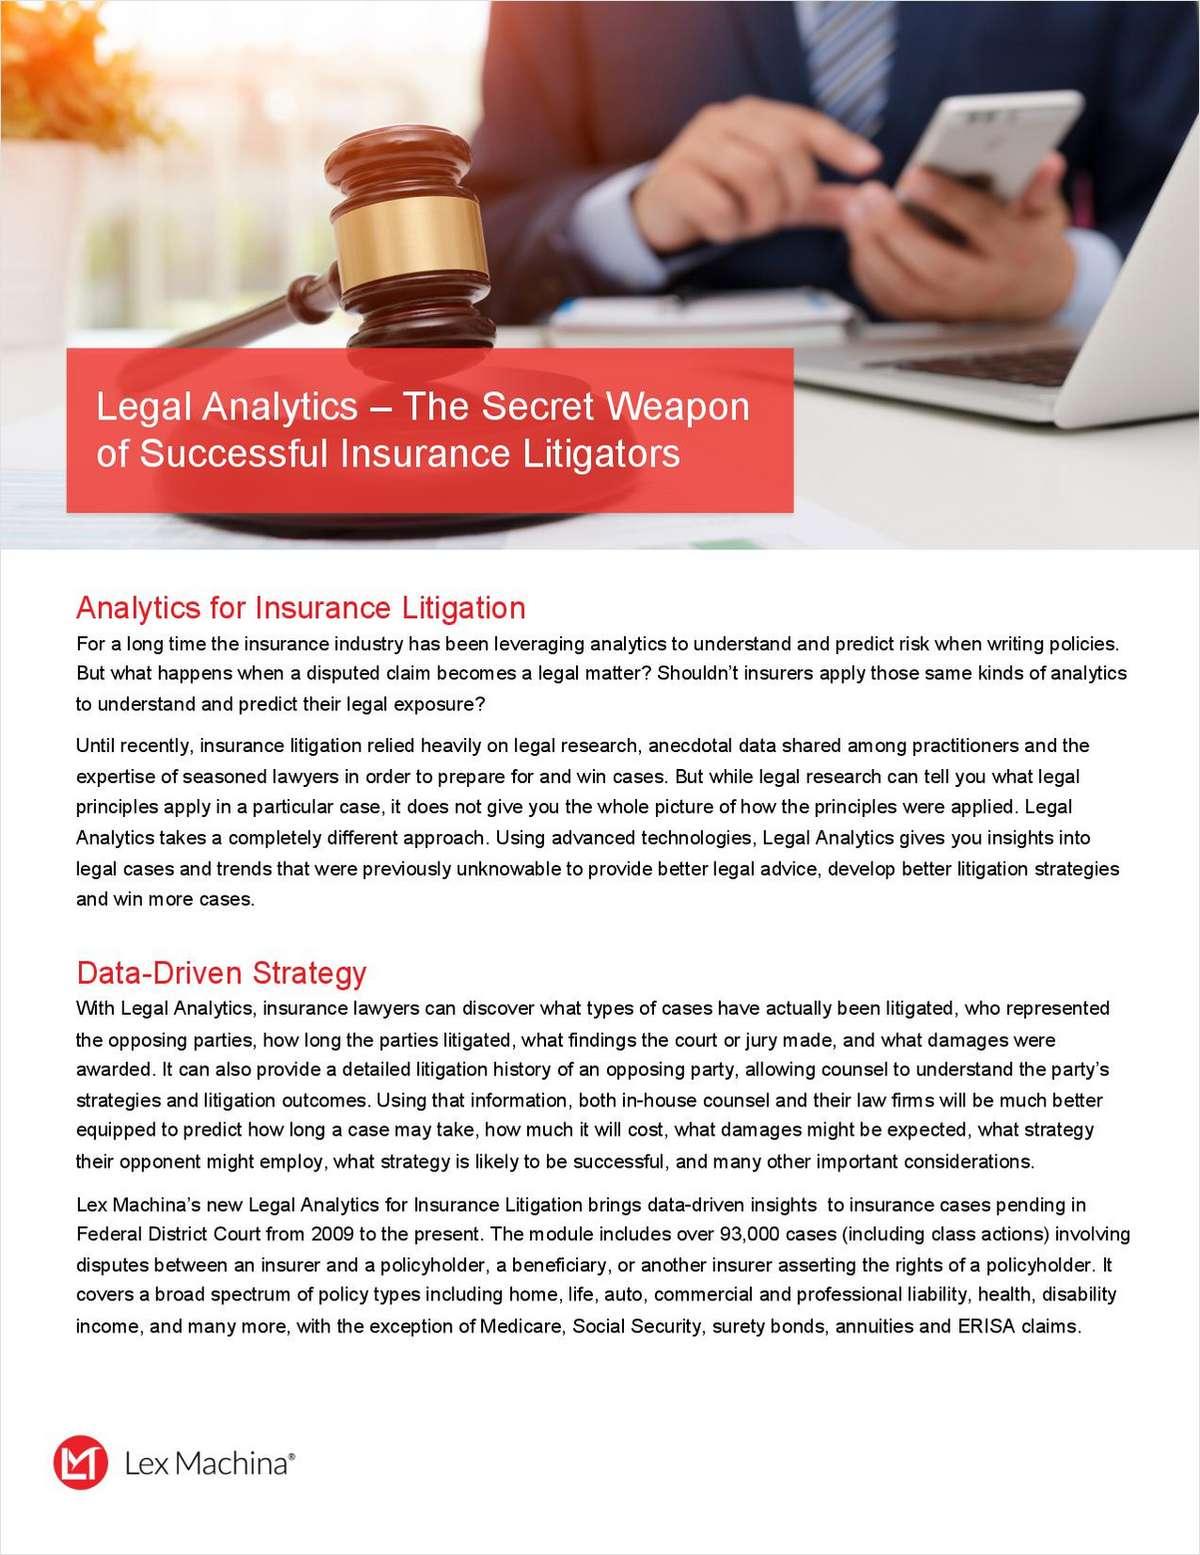 Legal Analytics - The Secret Weapon of Successful Insurance Litigators